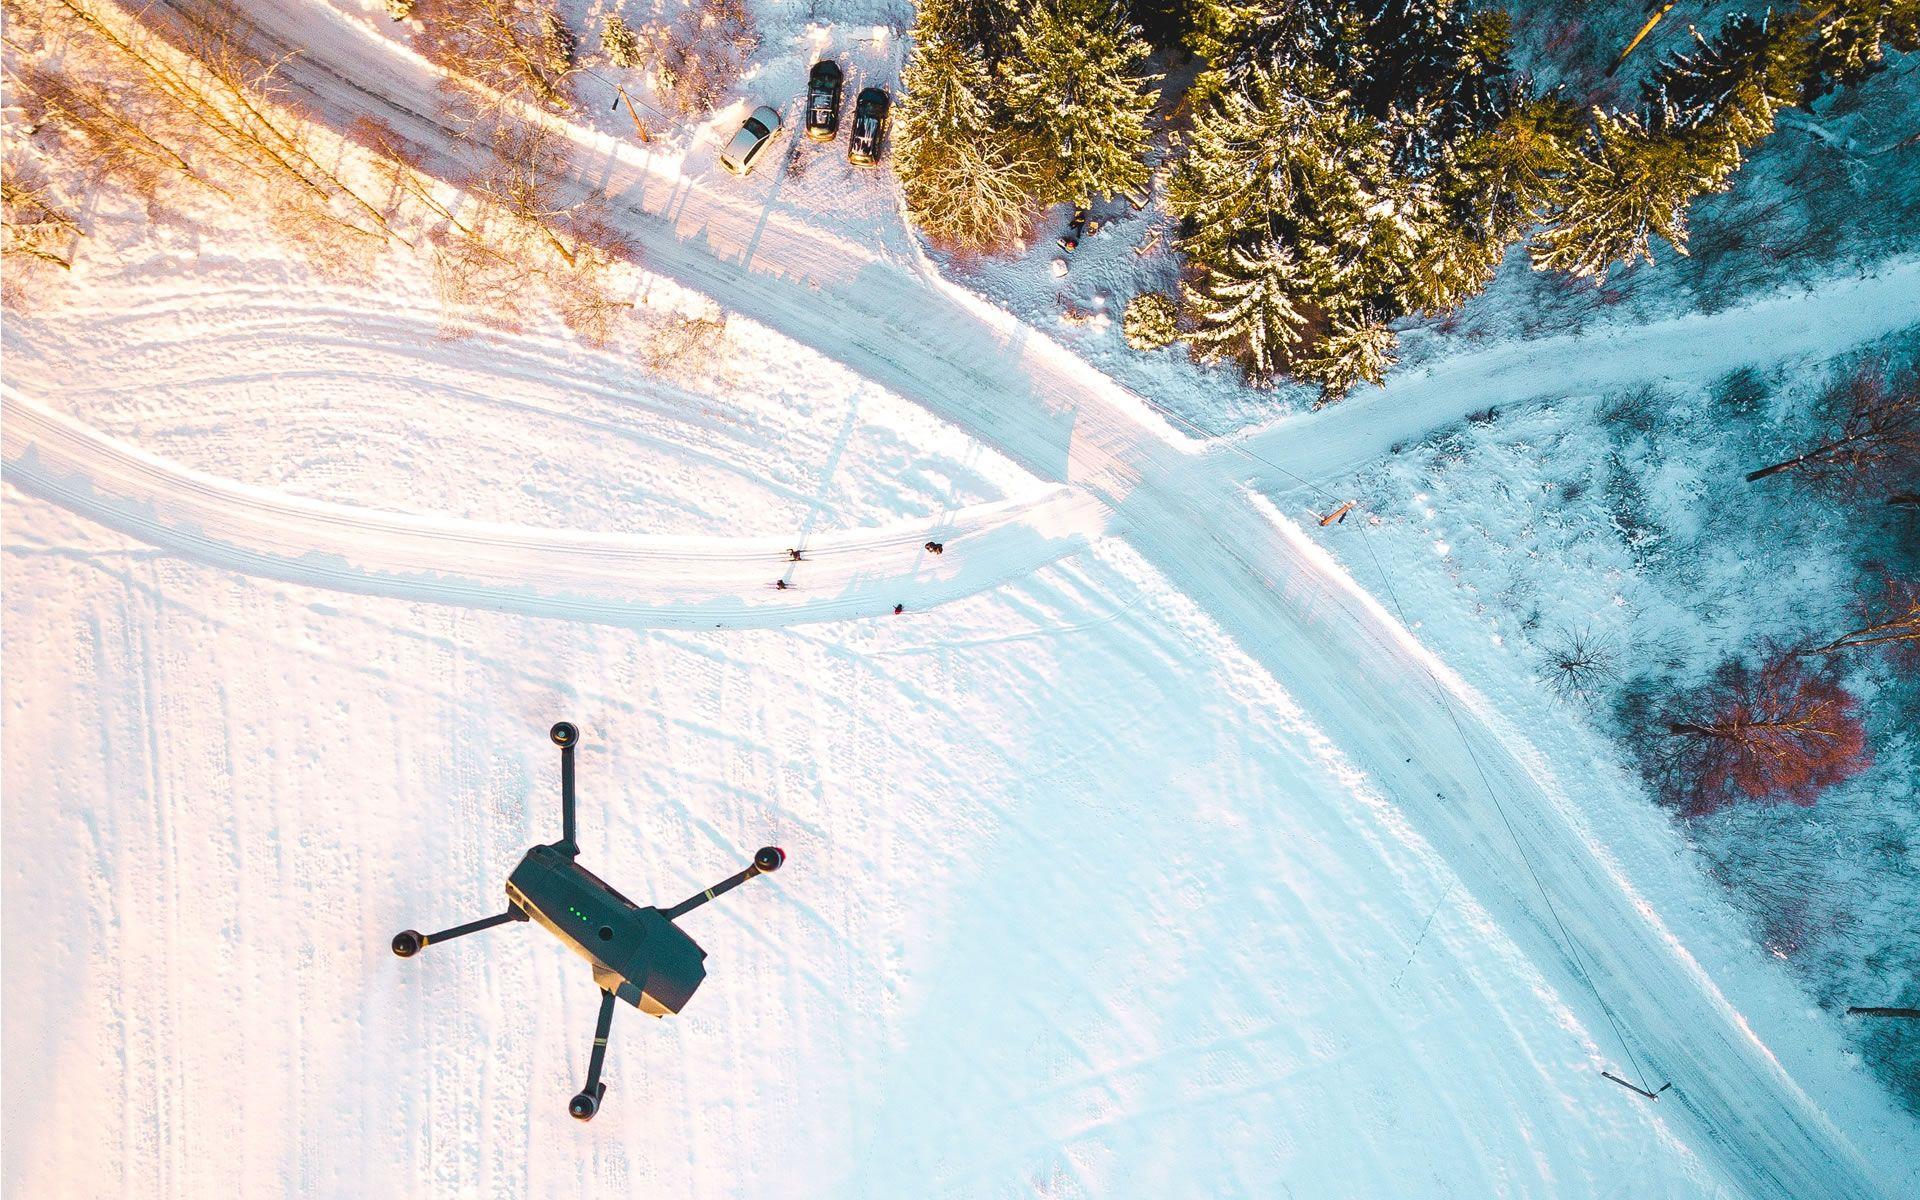 novela-zakona-civilni-letectvi-pravidla-drony-g